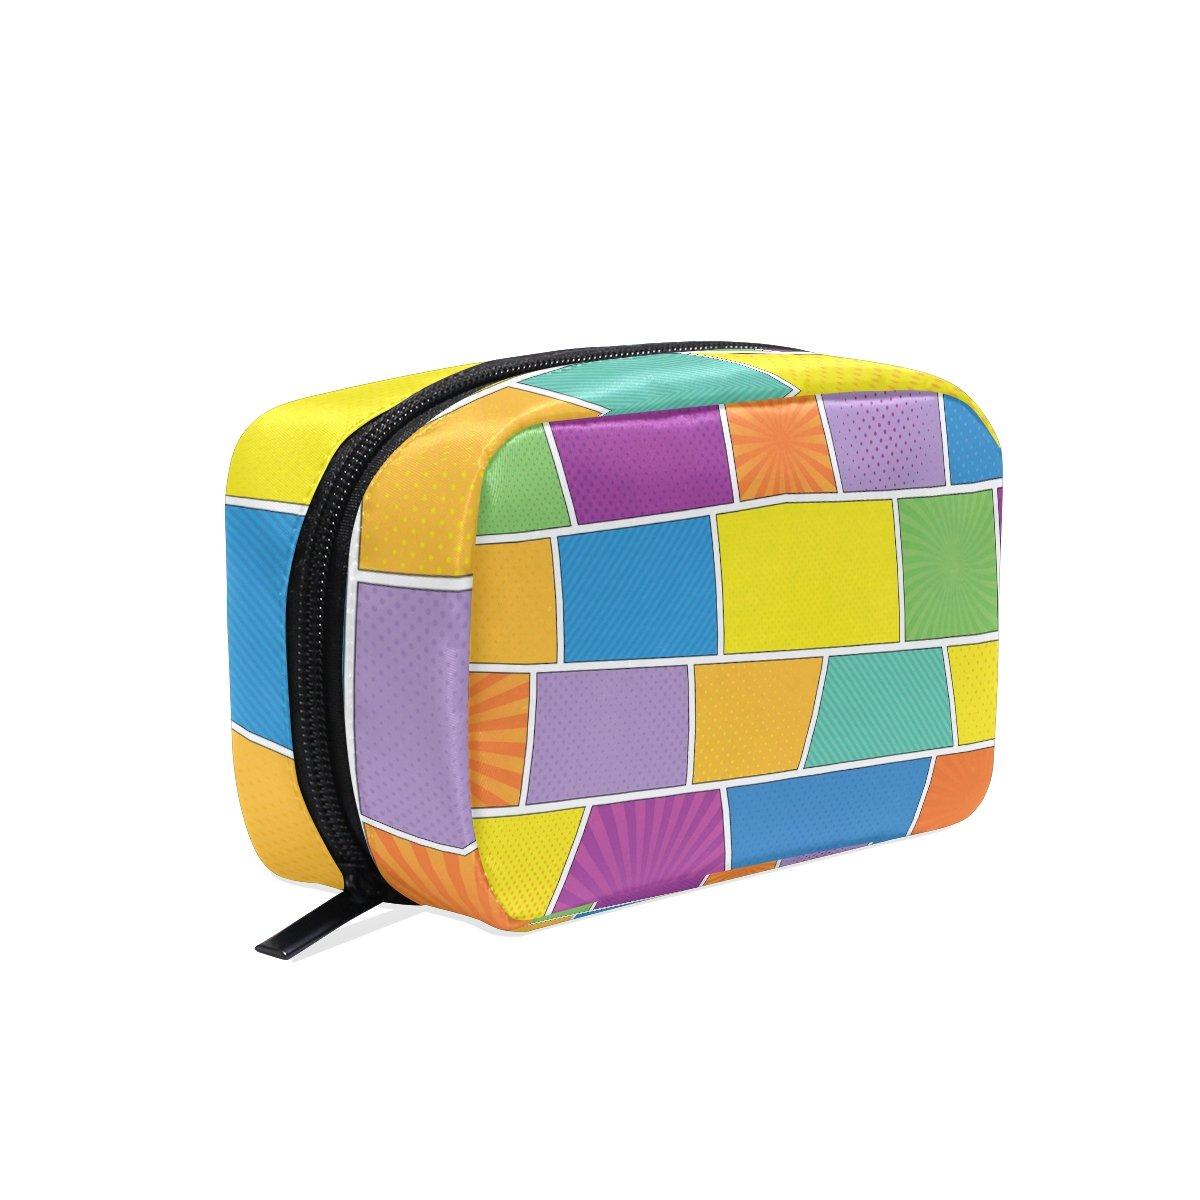 OREZI Toiletry Bag for women Girl Comic Book Cosmetic Bag Portable Travel Makeup Bag Organizer